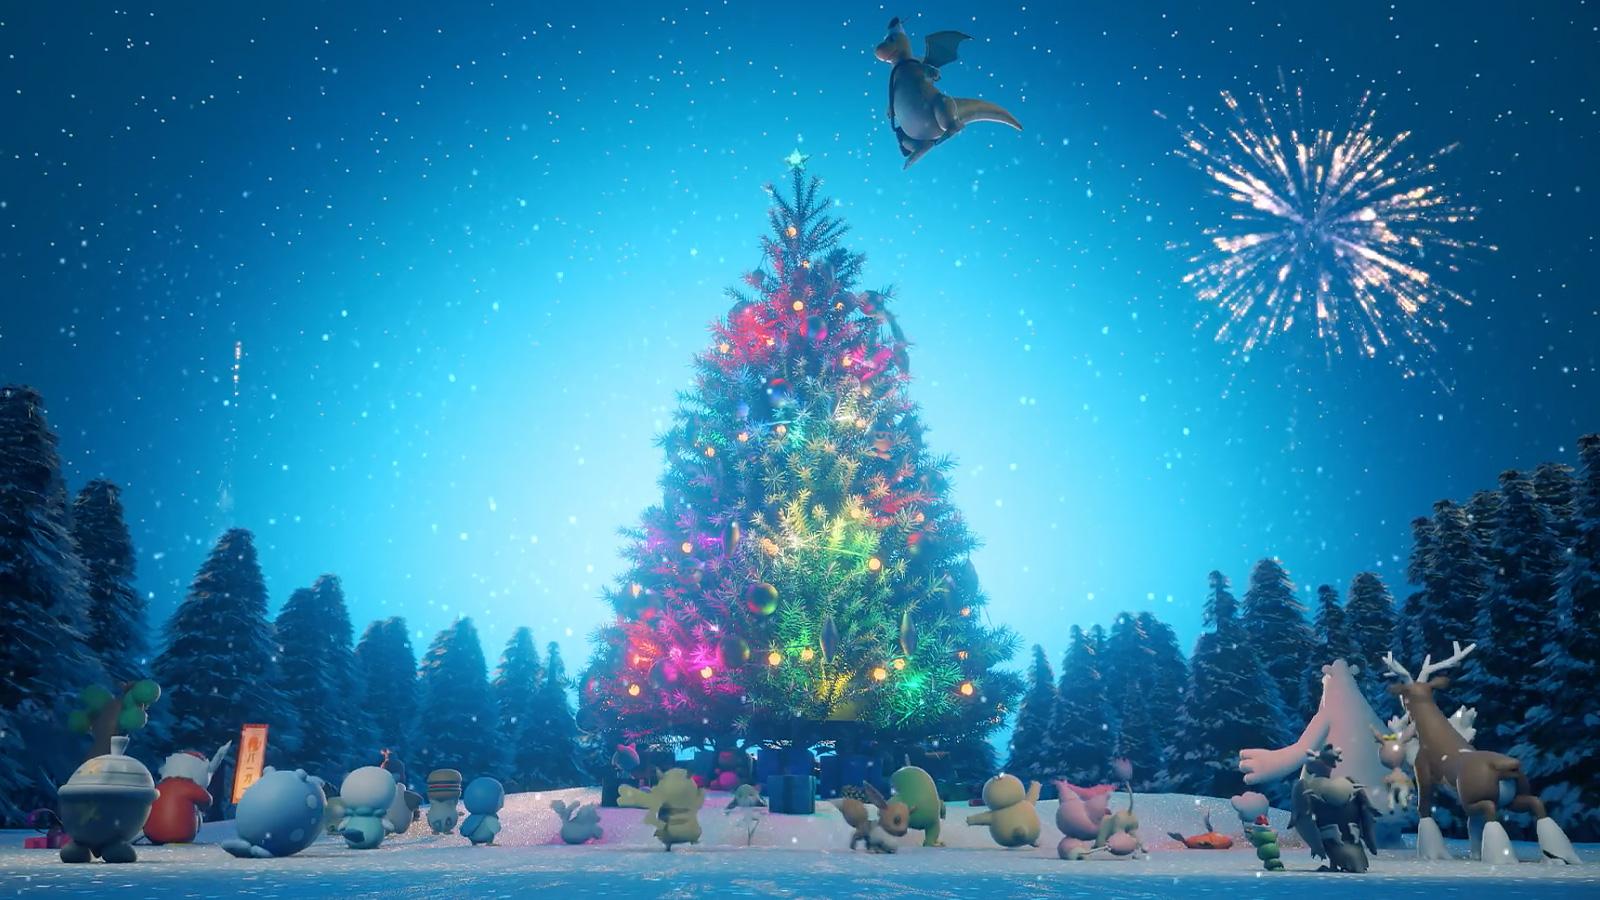 Screenshot of Pokemon gathering around Christmas tree in animation short by GIo.